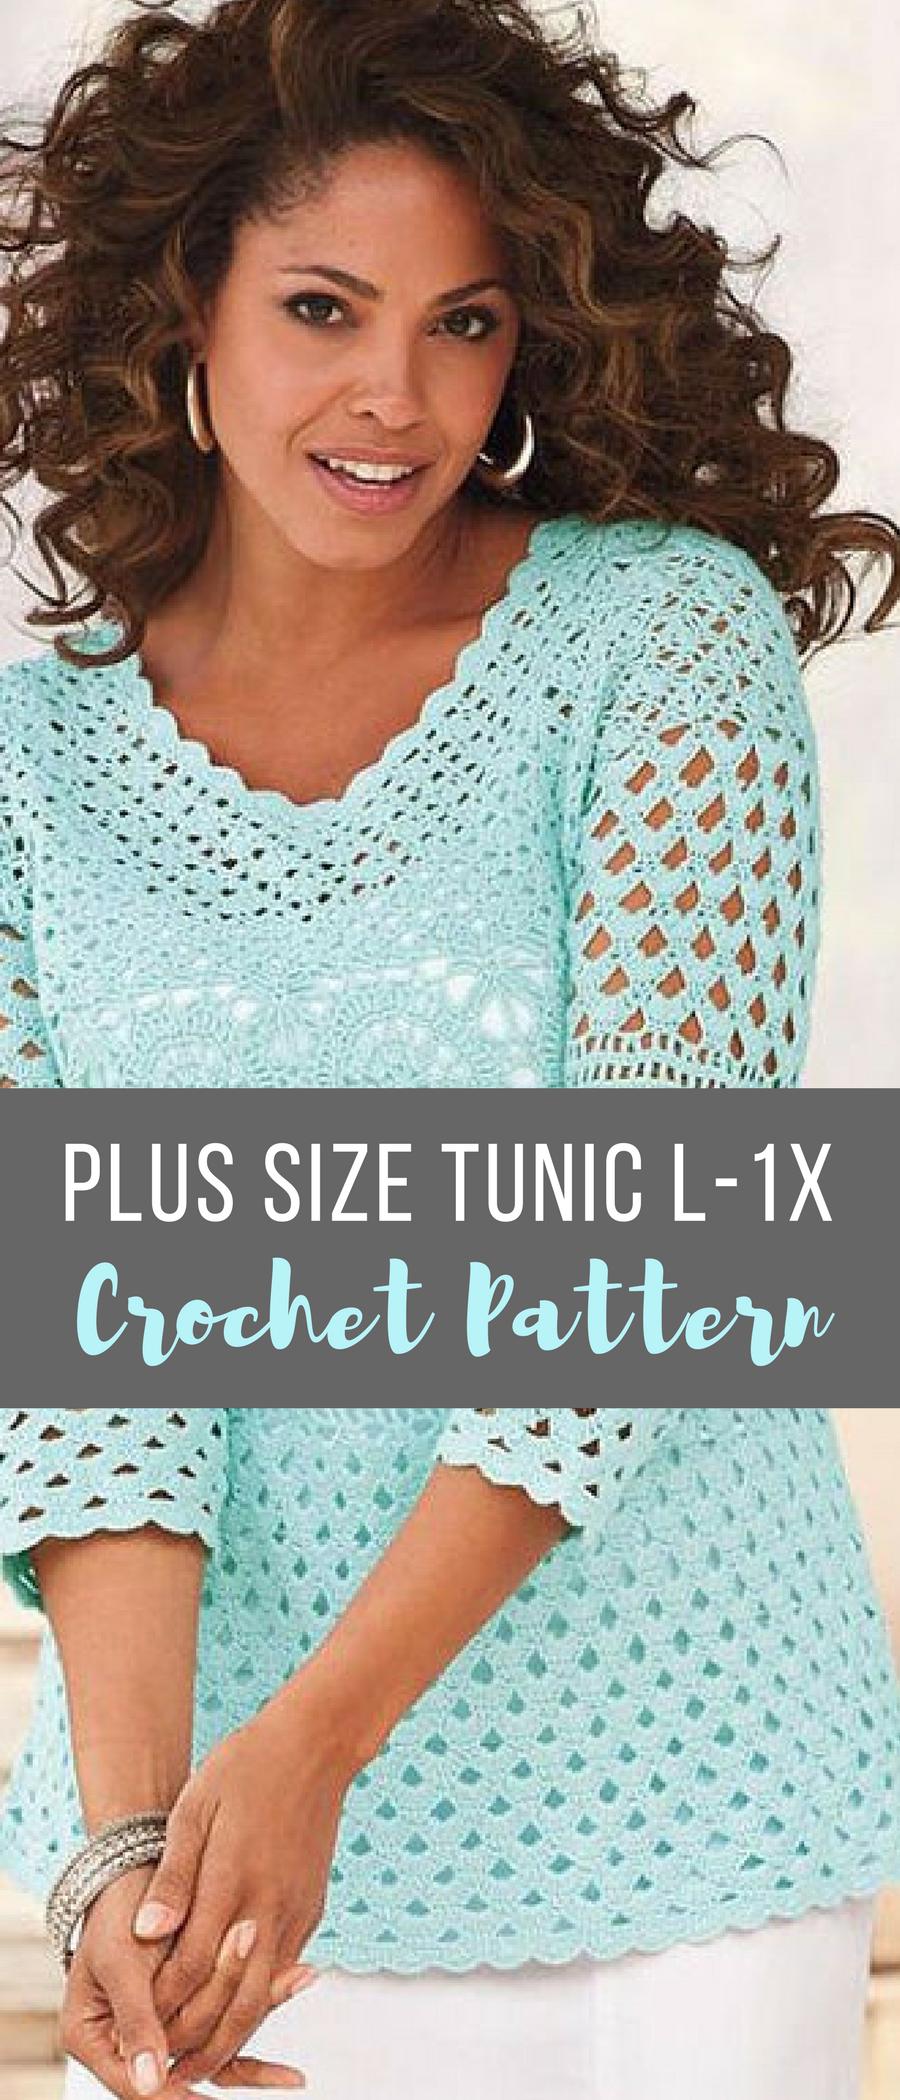 Plus Size Crochet Patterns Amazing Inspiration Ideas